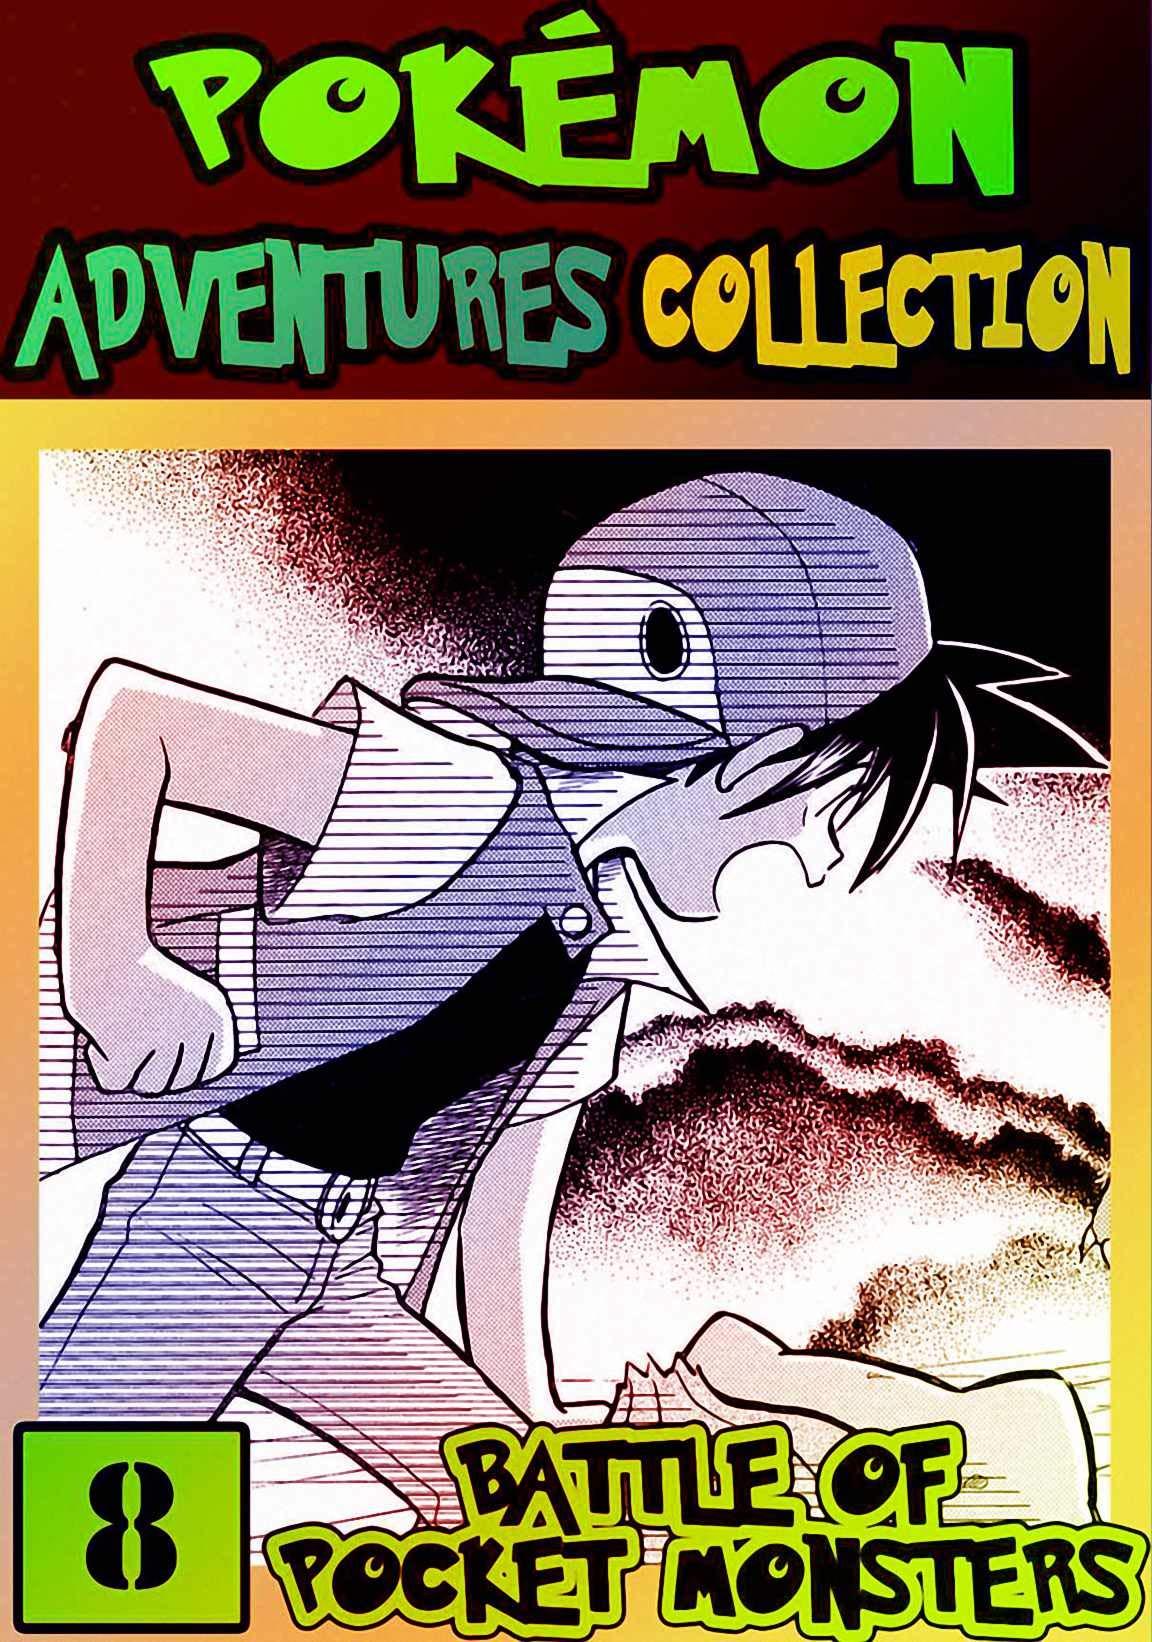 Battle Monsters: Collection 8 - Manga Adventures Graphic Novel Pokemon For Boys, Girls, Kids